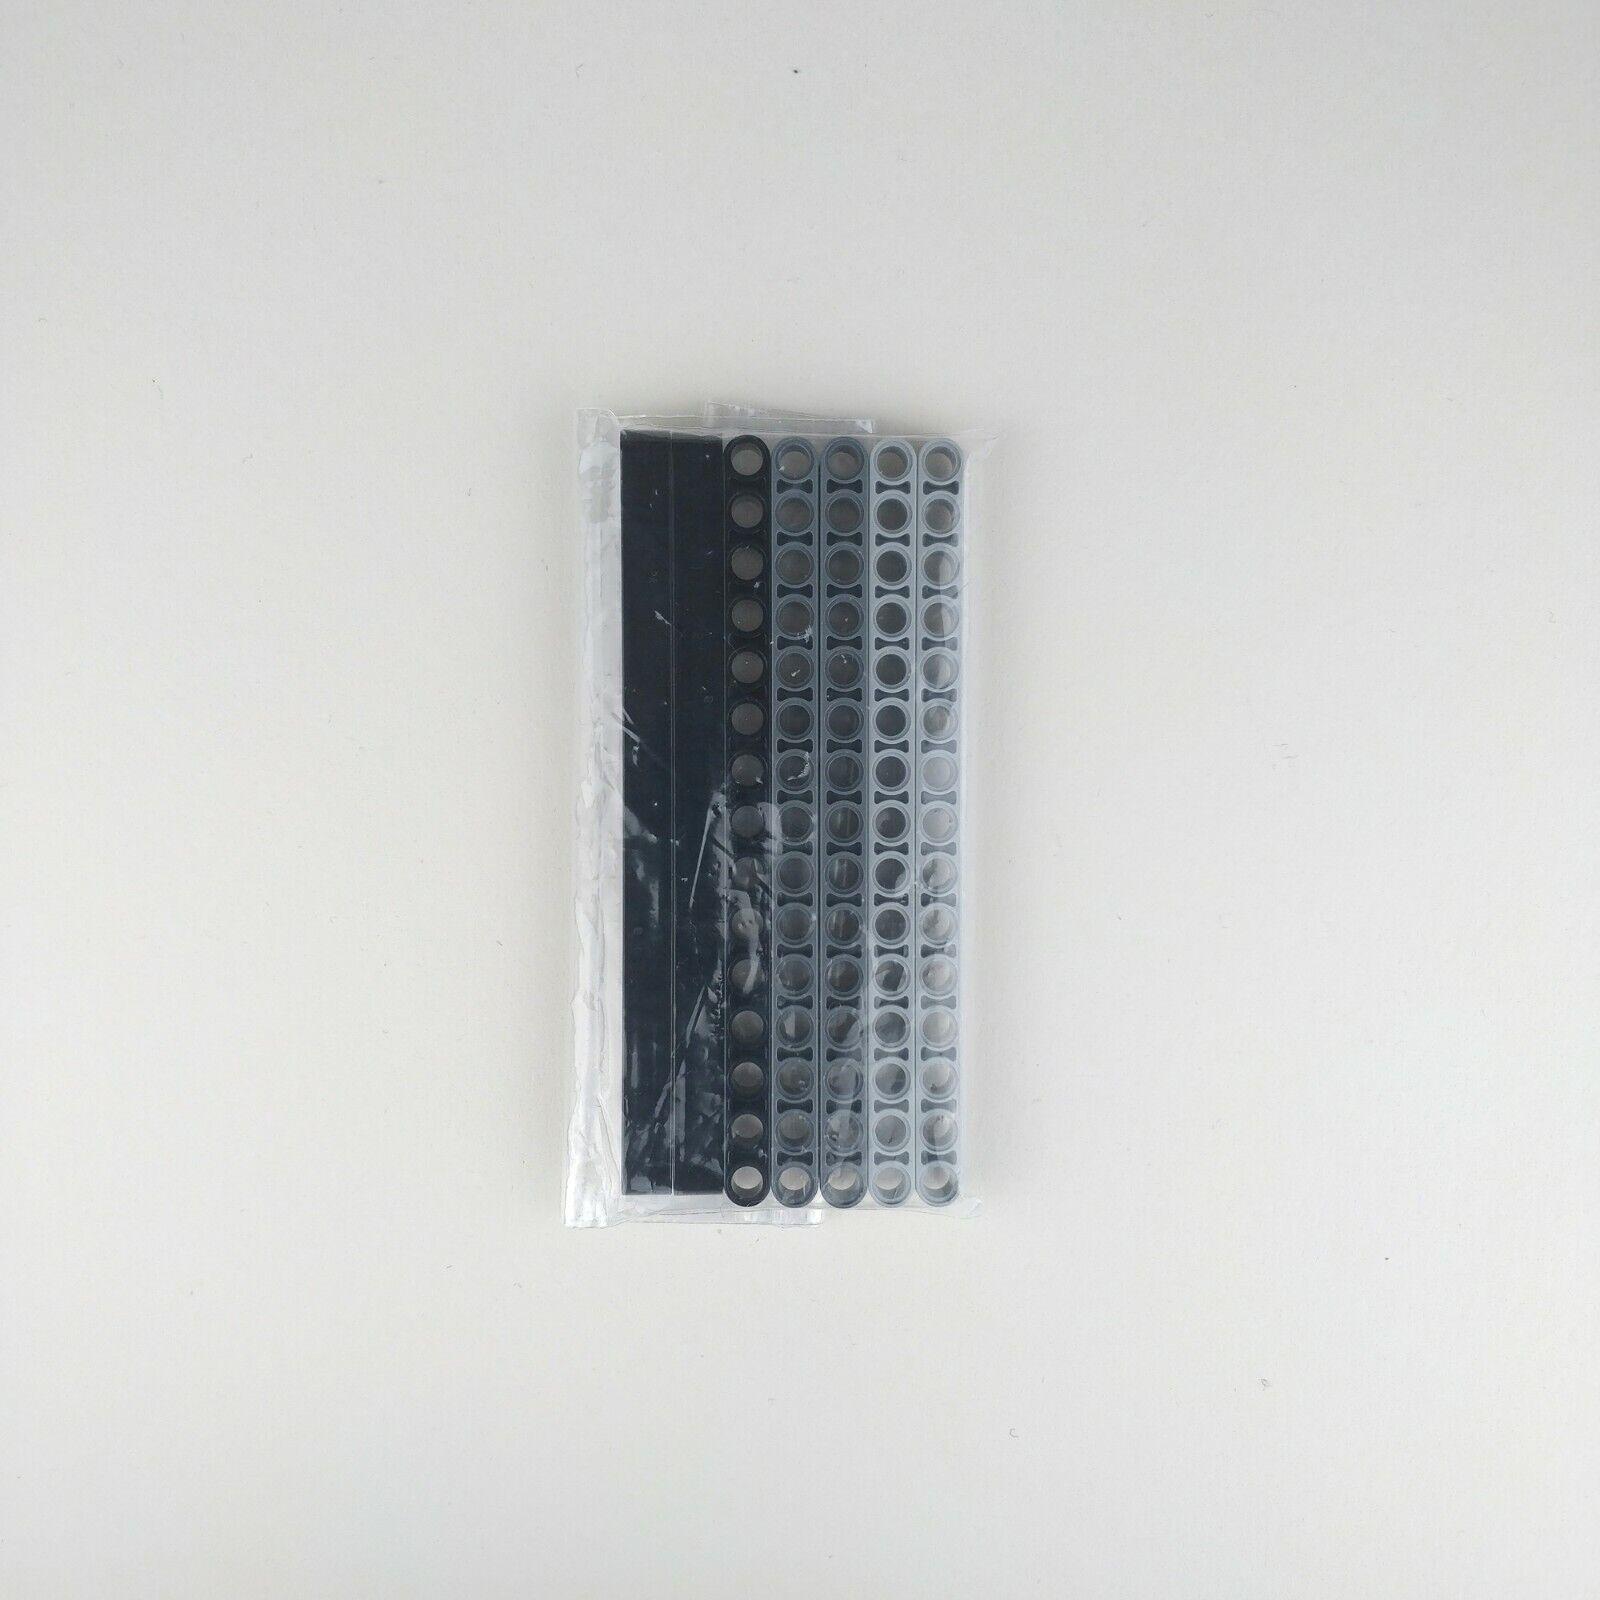 169pc LEGO MINDSTORMS EV3 BULK PART SET: Liftarm Connector Pin Bush TECHNIC